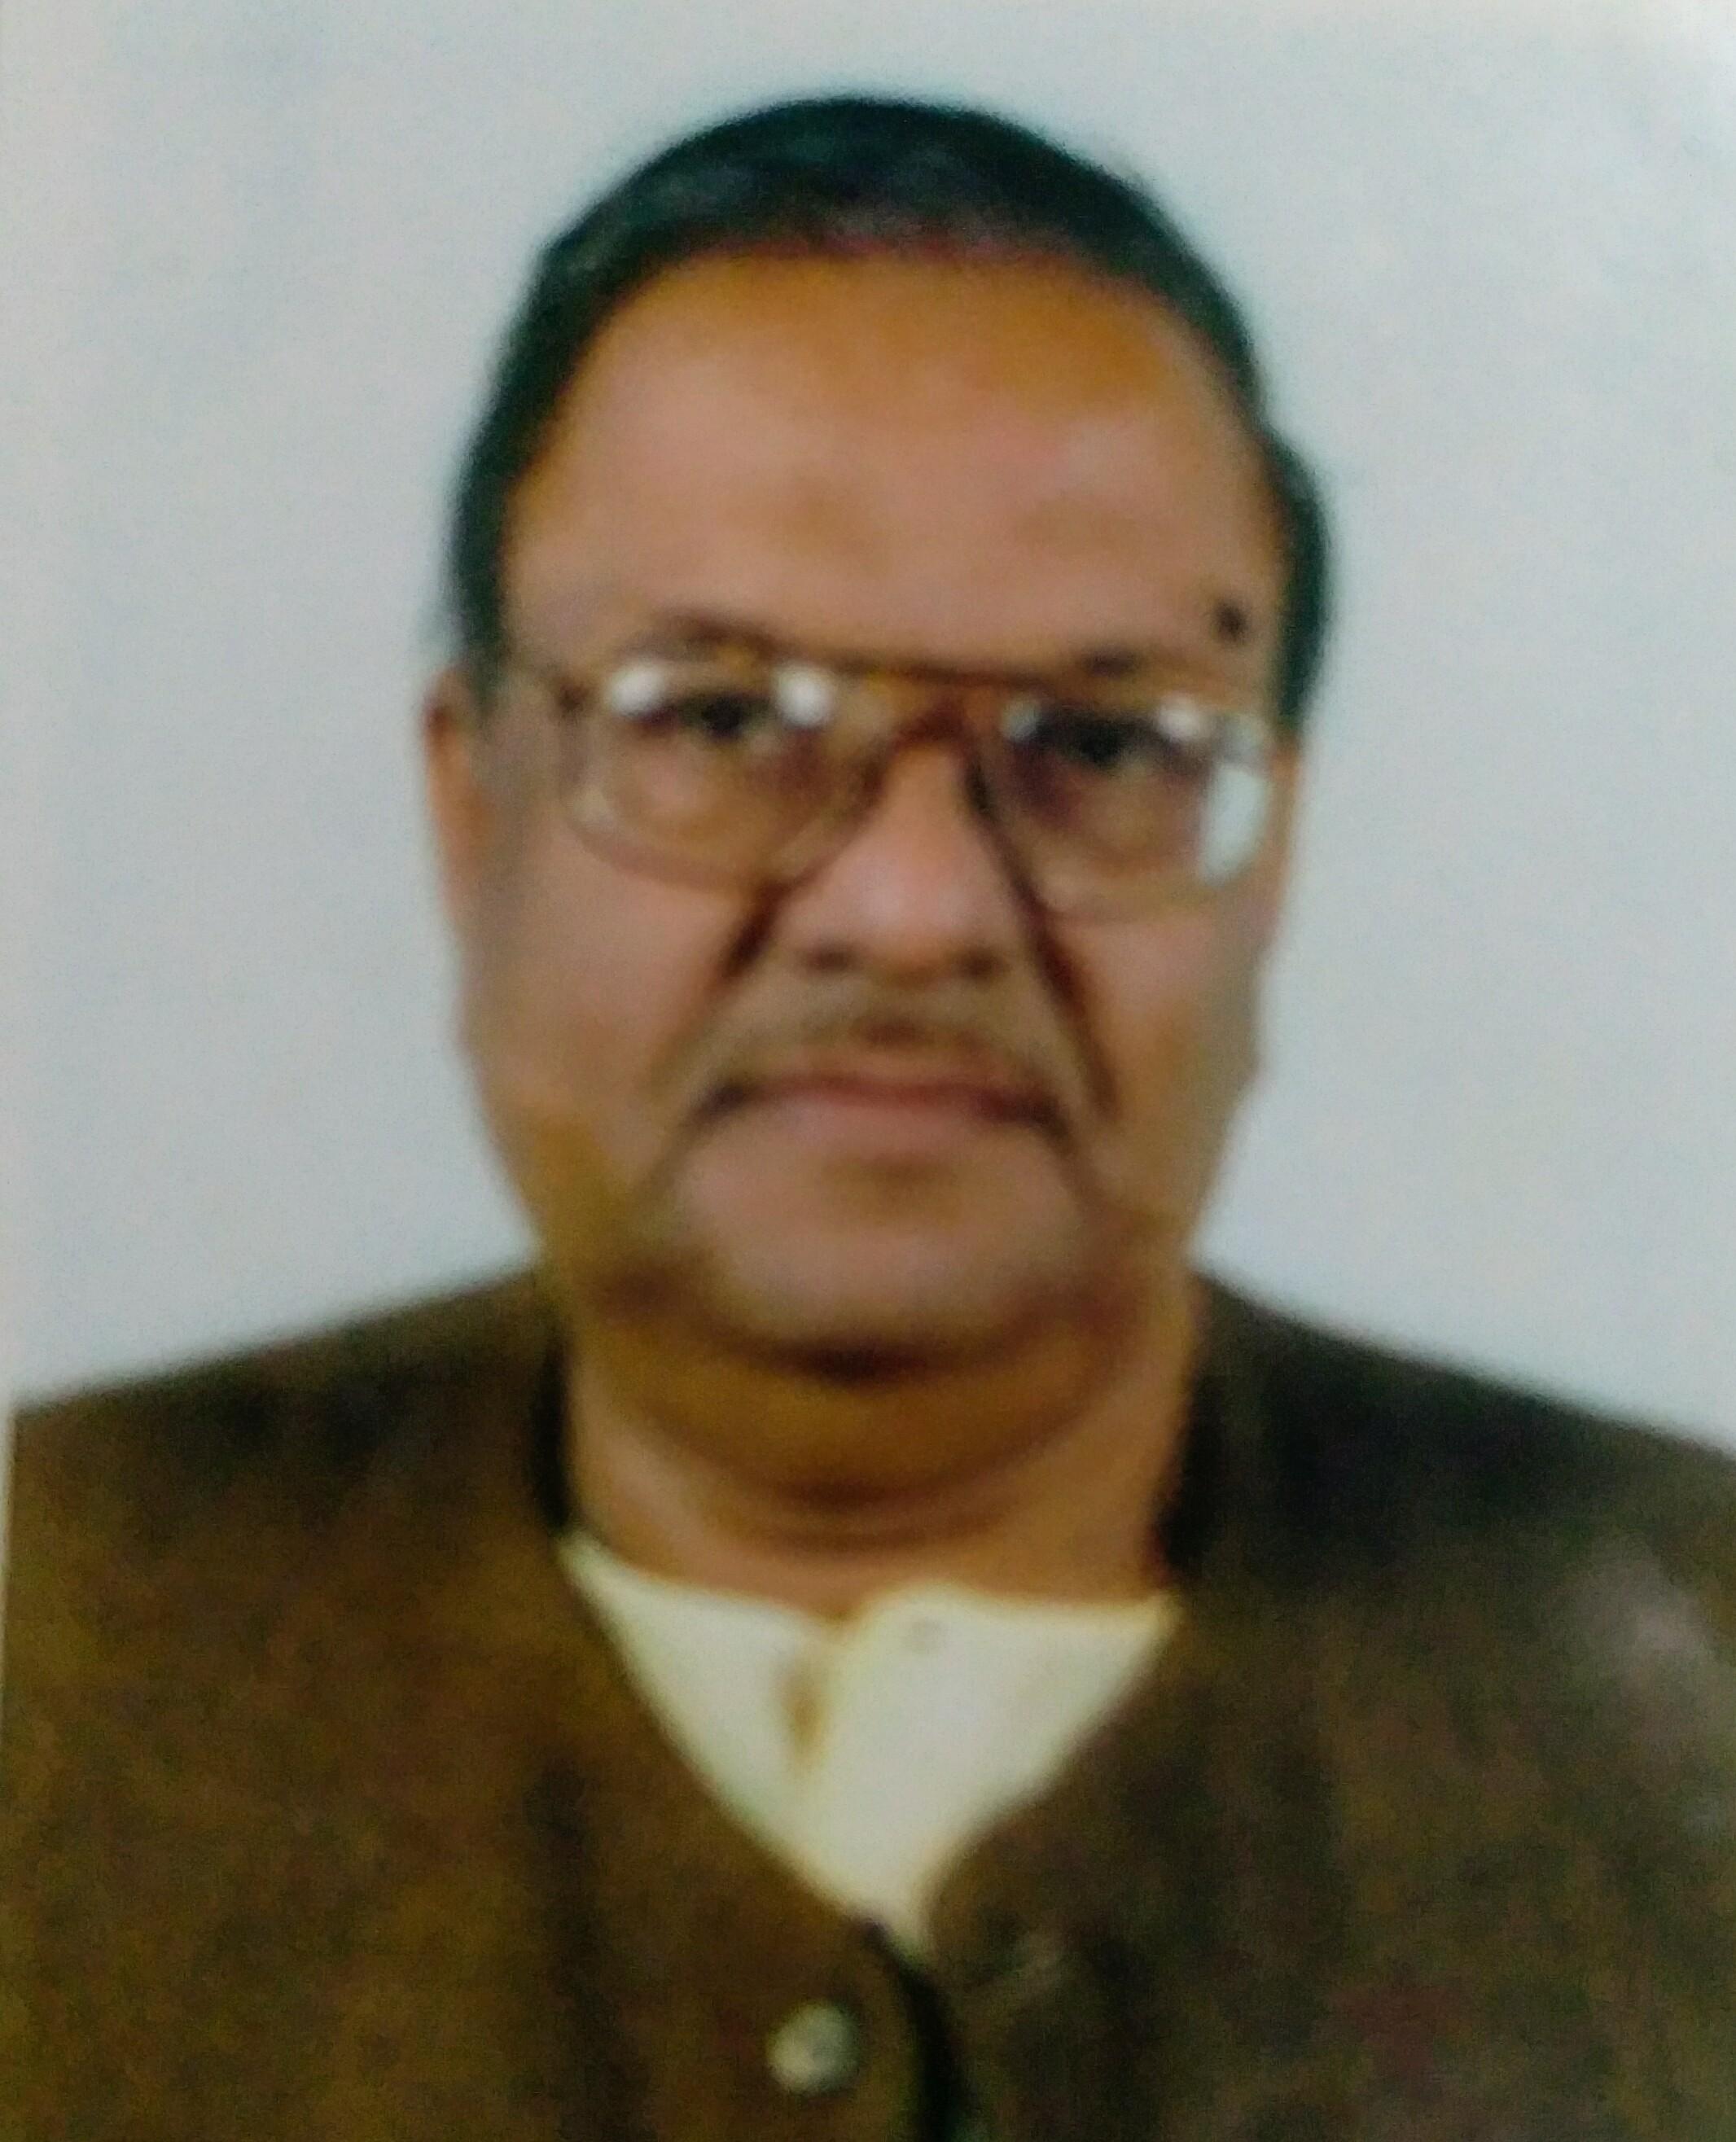 राम किशन लुहारीवाला